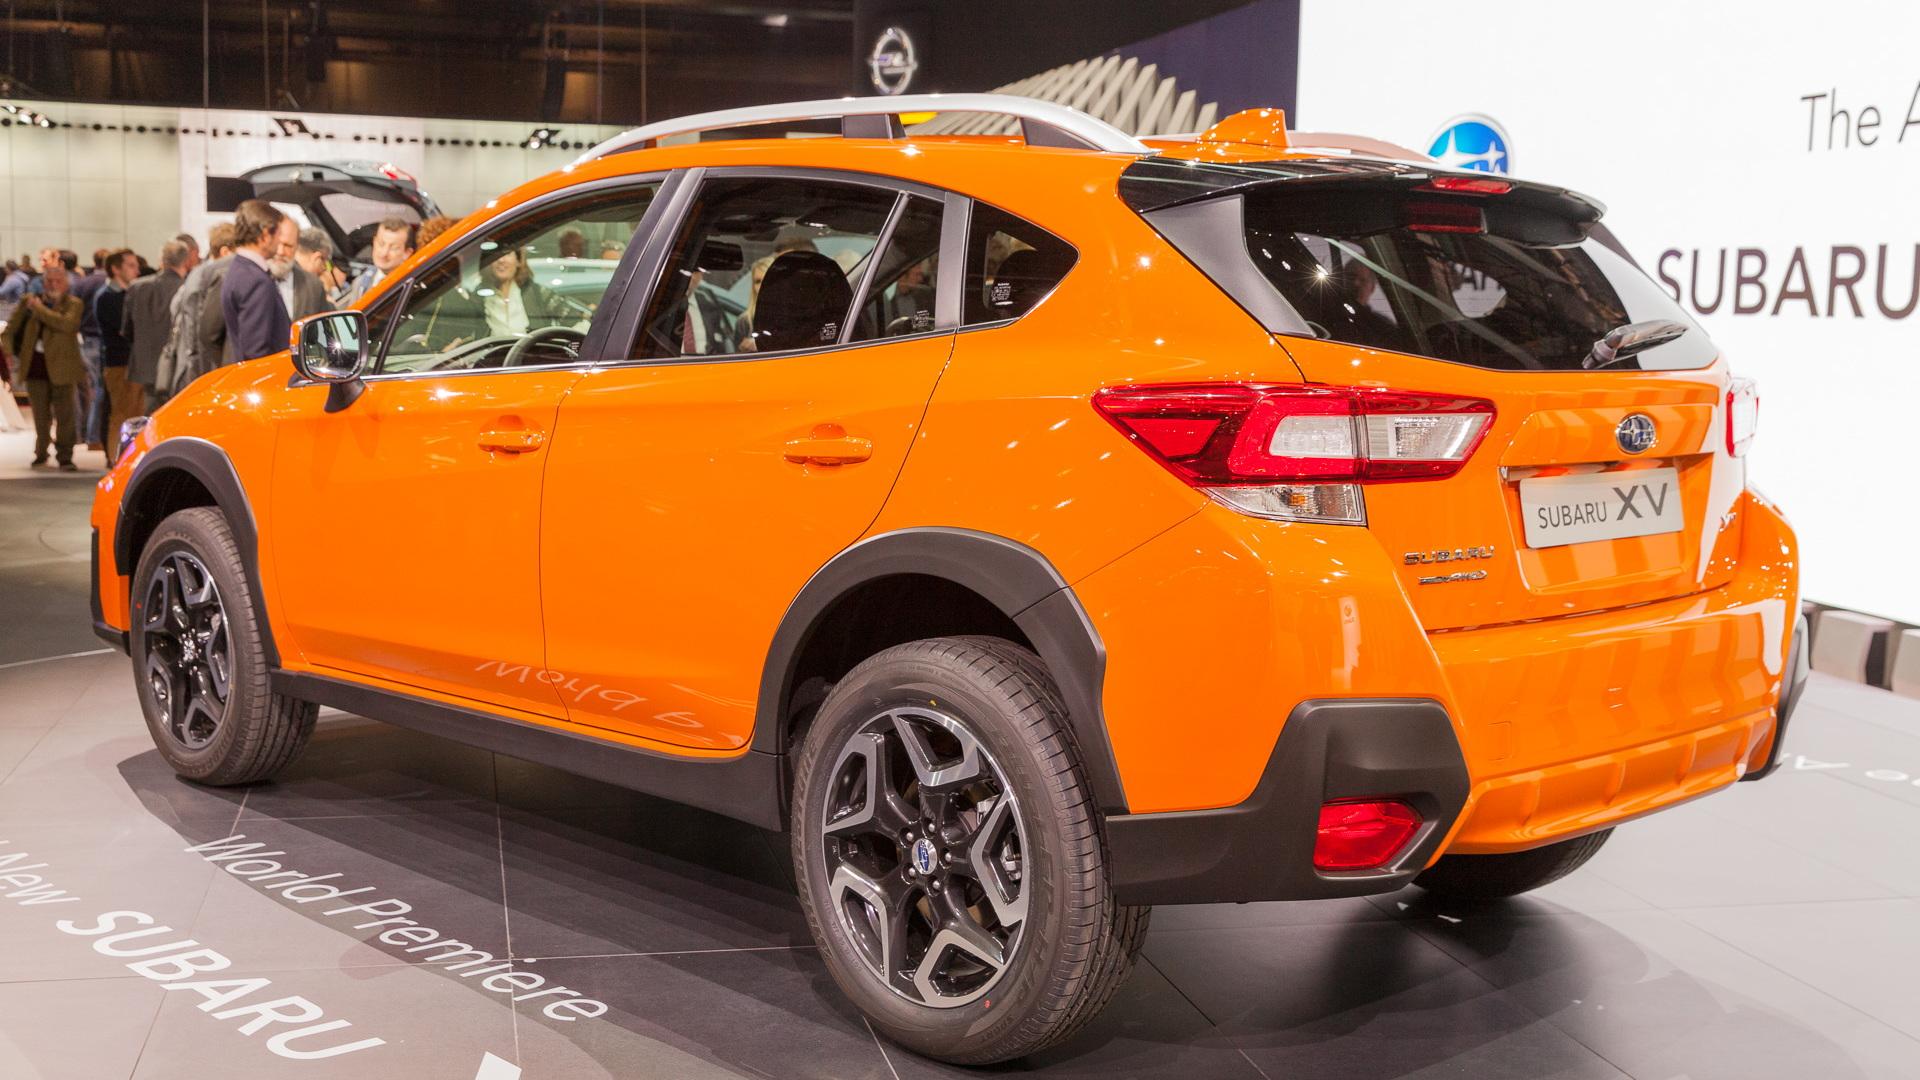 2018 Subaru Crosstrek, 2017 Geneva auto show